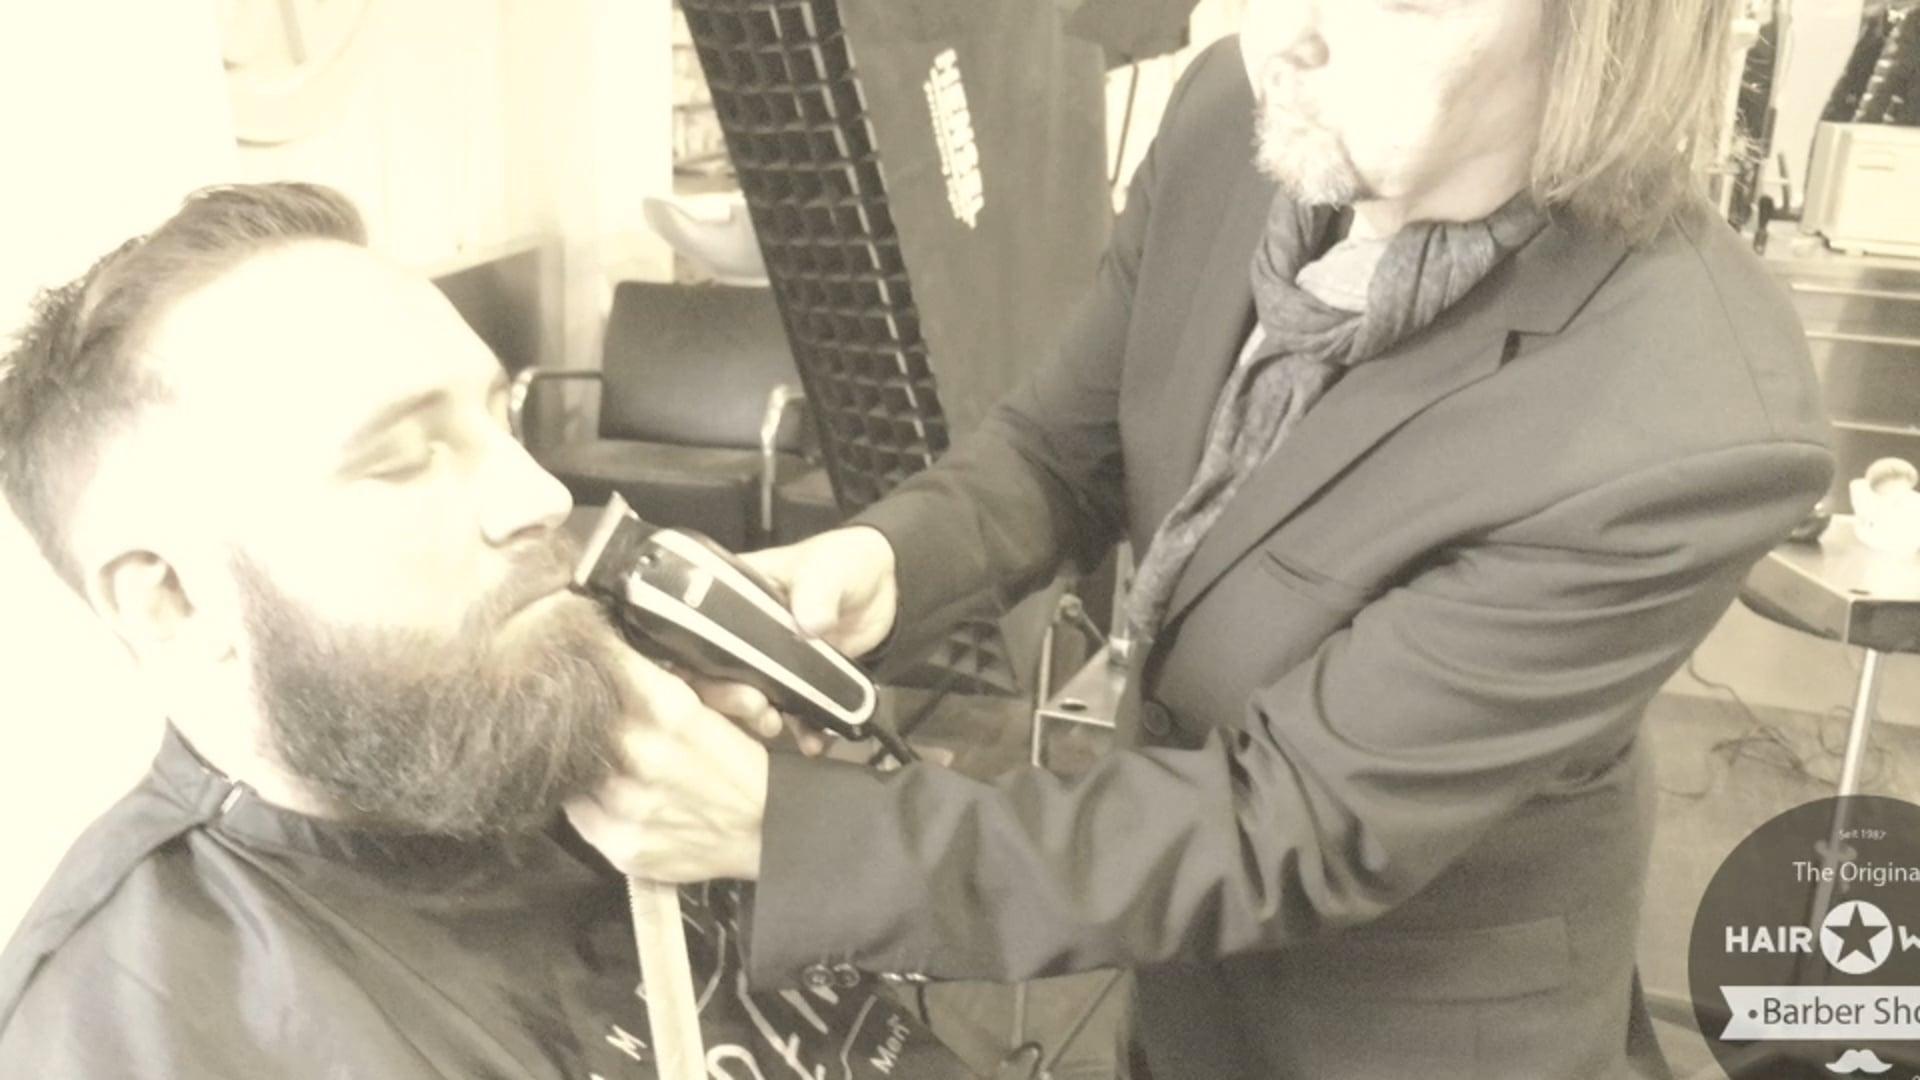 HAIR-WOLF Barbershop Bart